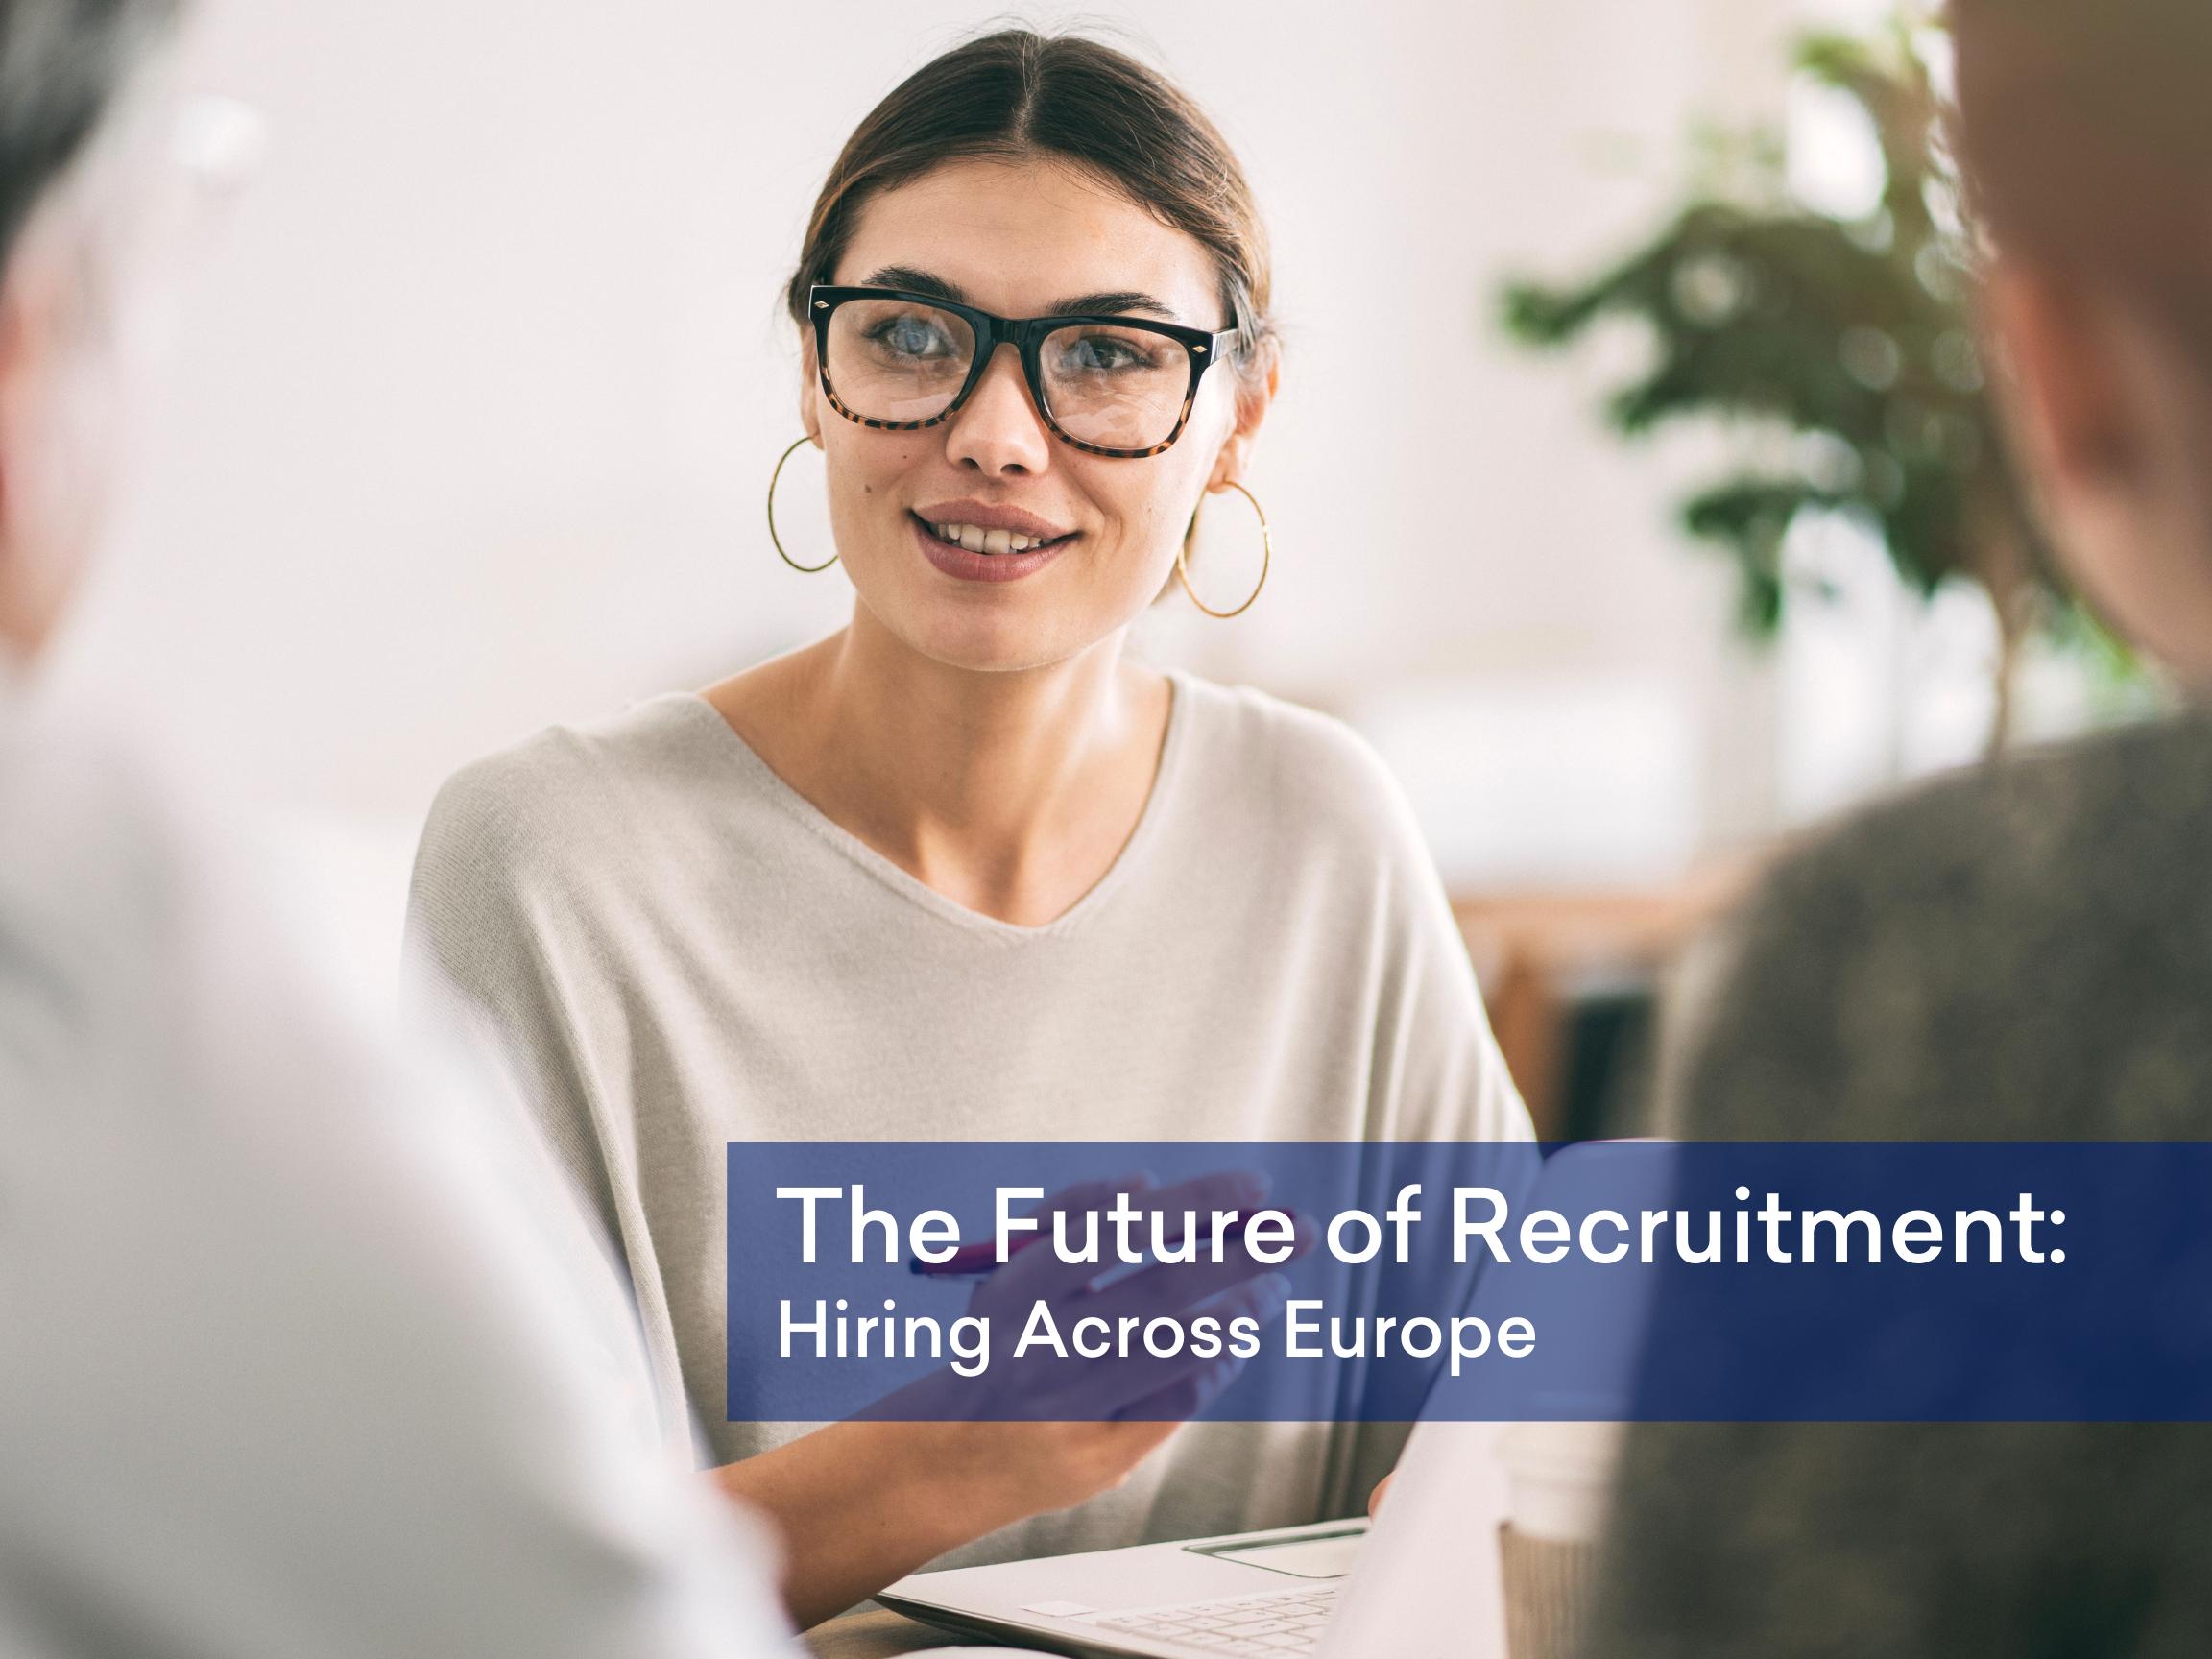 The Future of Recruitment: Hiring Across Europe